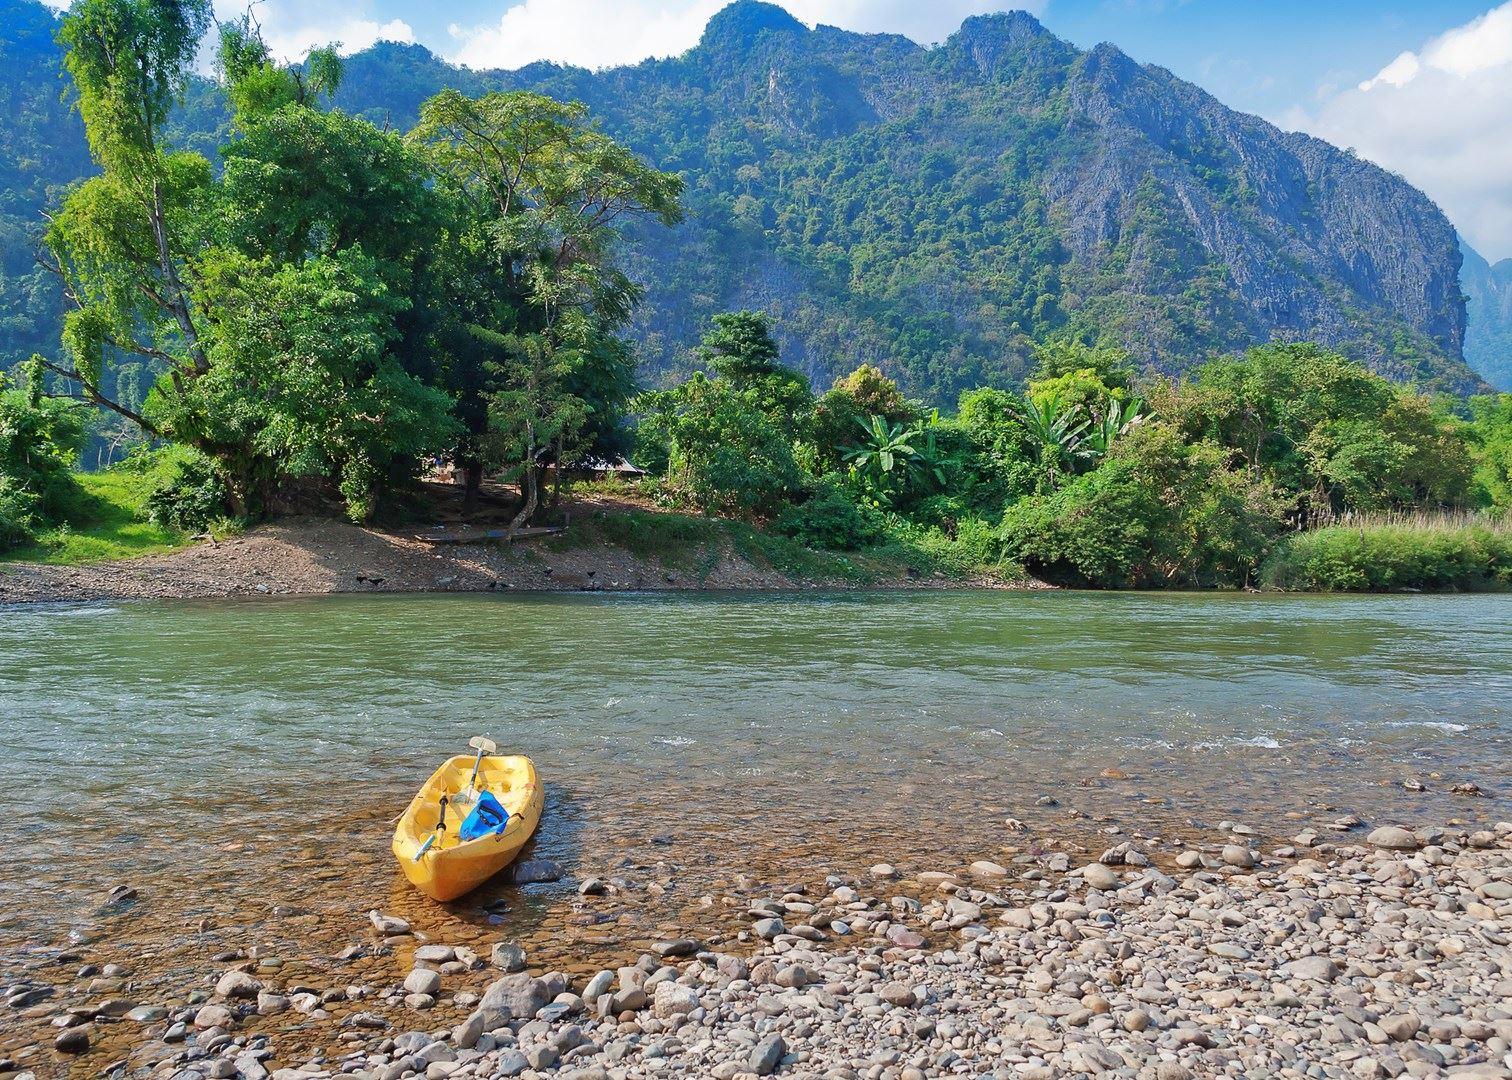 Vang Vieng Laos 2017 - DJI Drone Mavic Pro + GoPro + Canon ...   Vang Vieng Trip